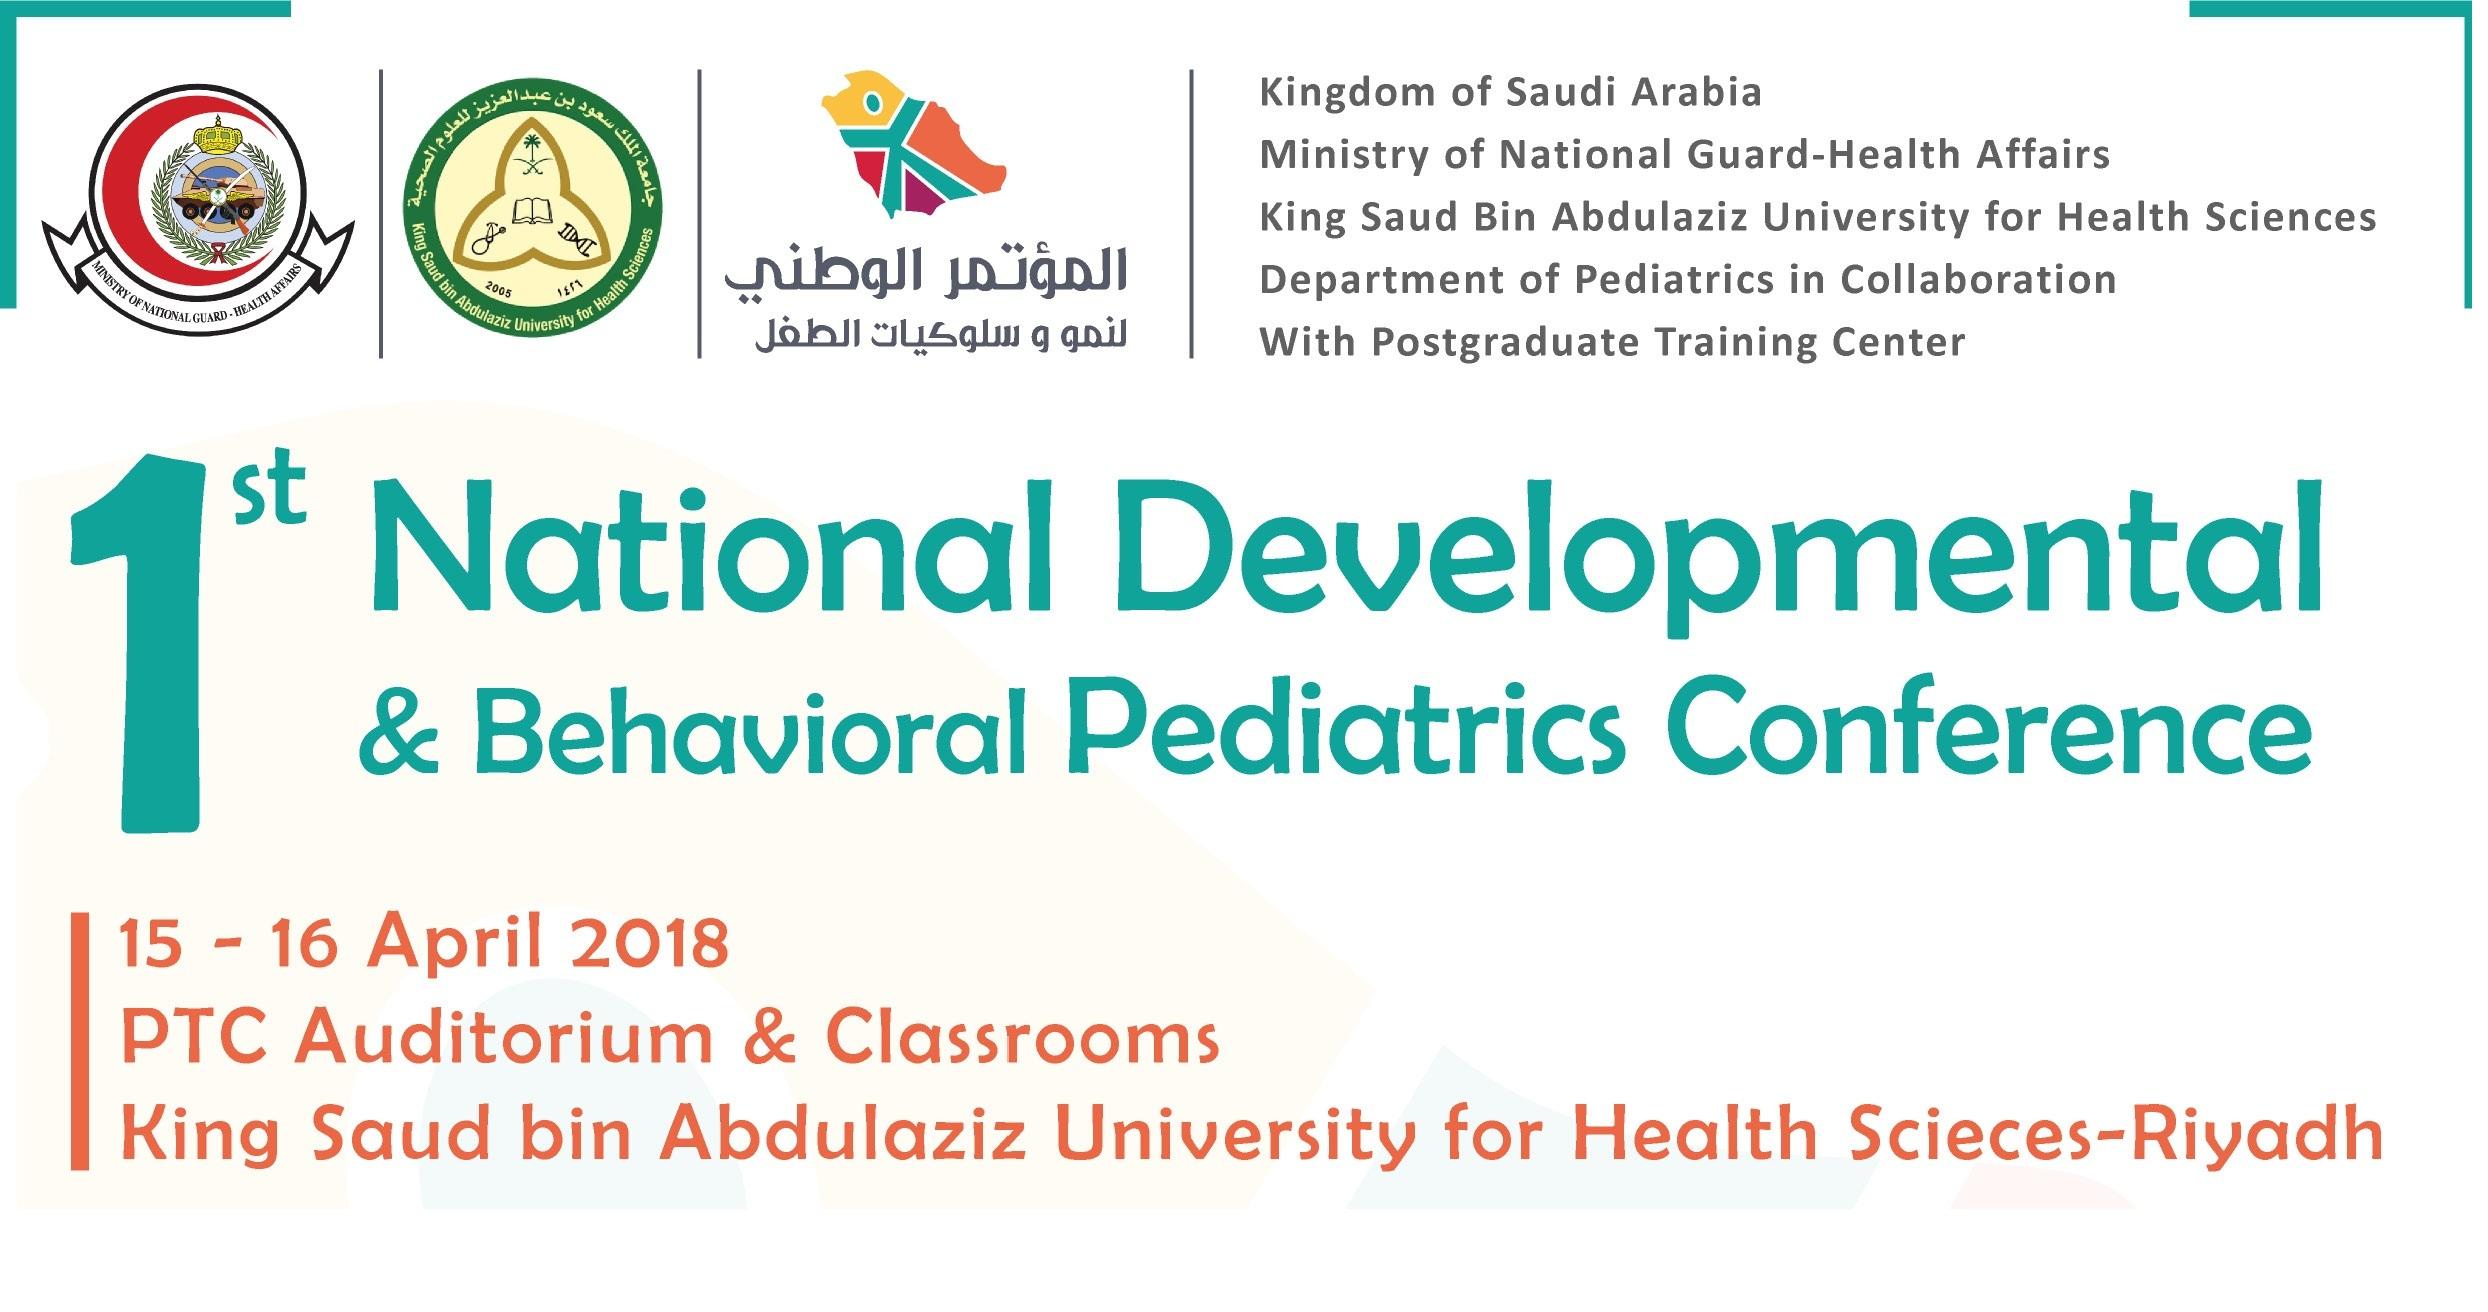 1st National Developmental & Behavioral Pediatrics Conference